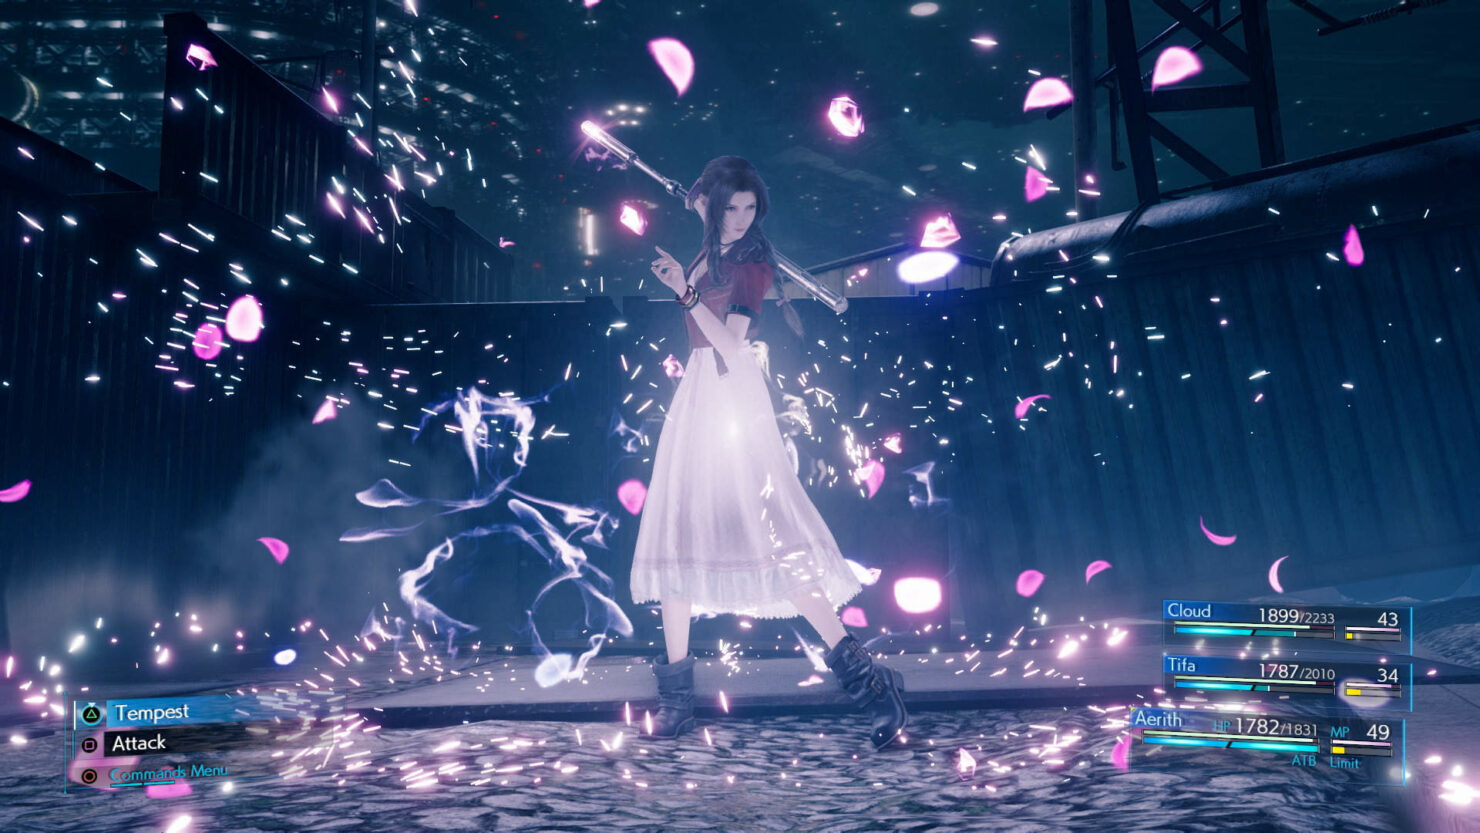 final-fantasy-vii-remake-screenshots-info-4454353